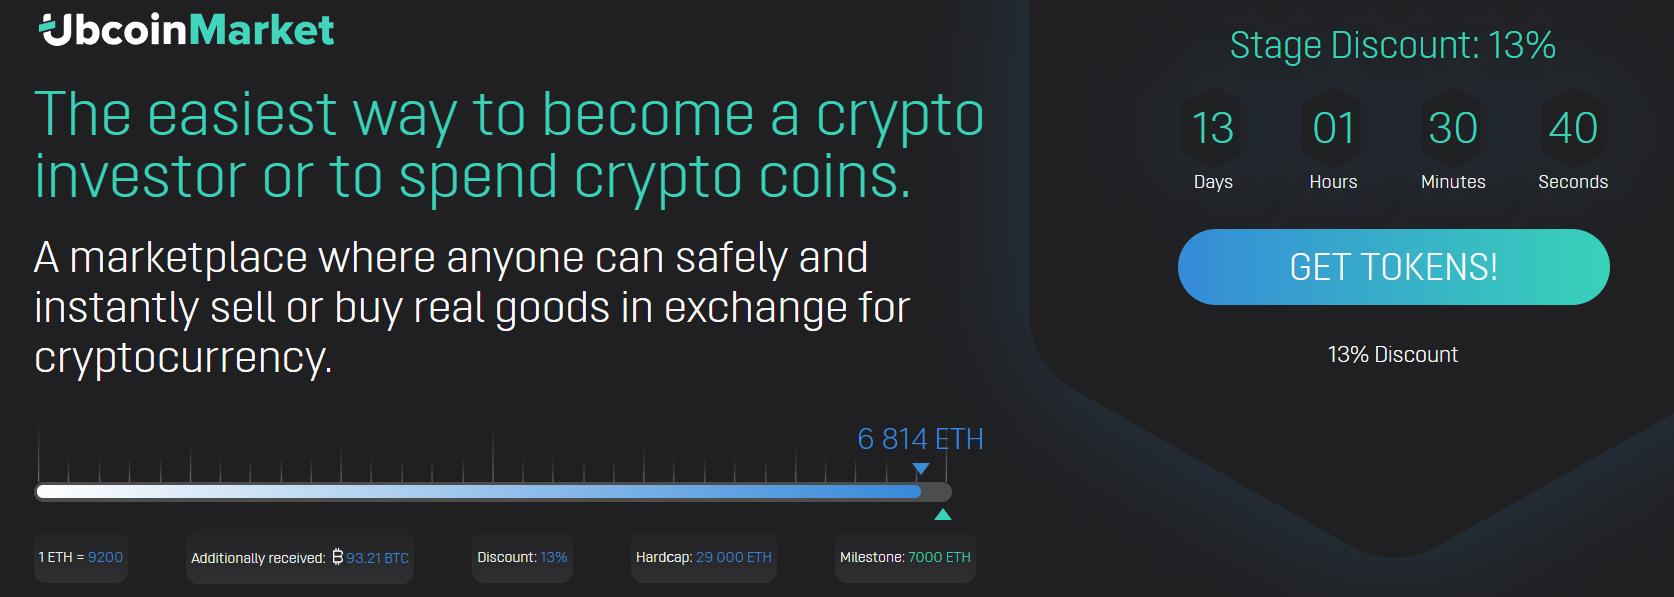 Ubcoin Digital Exchange Photo